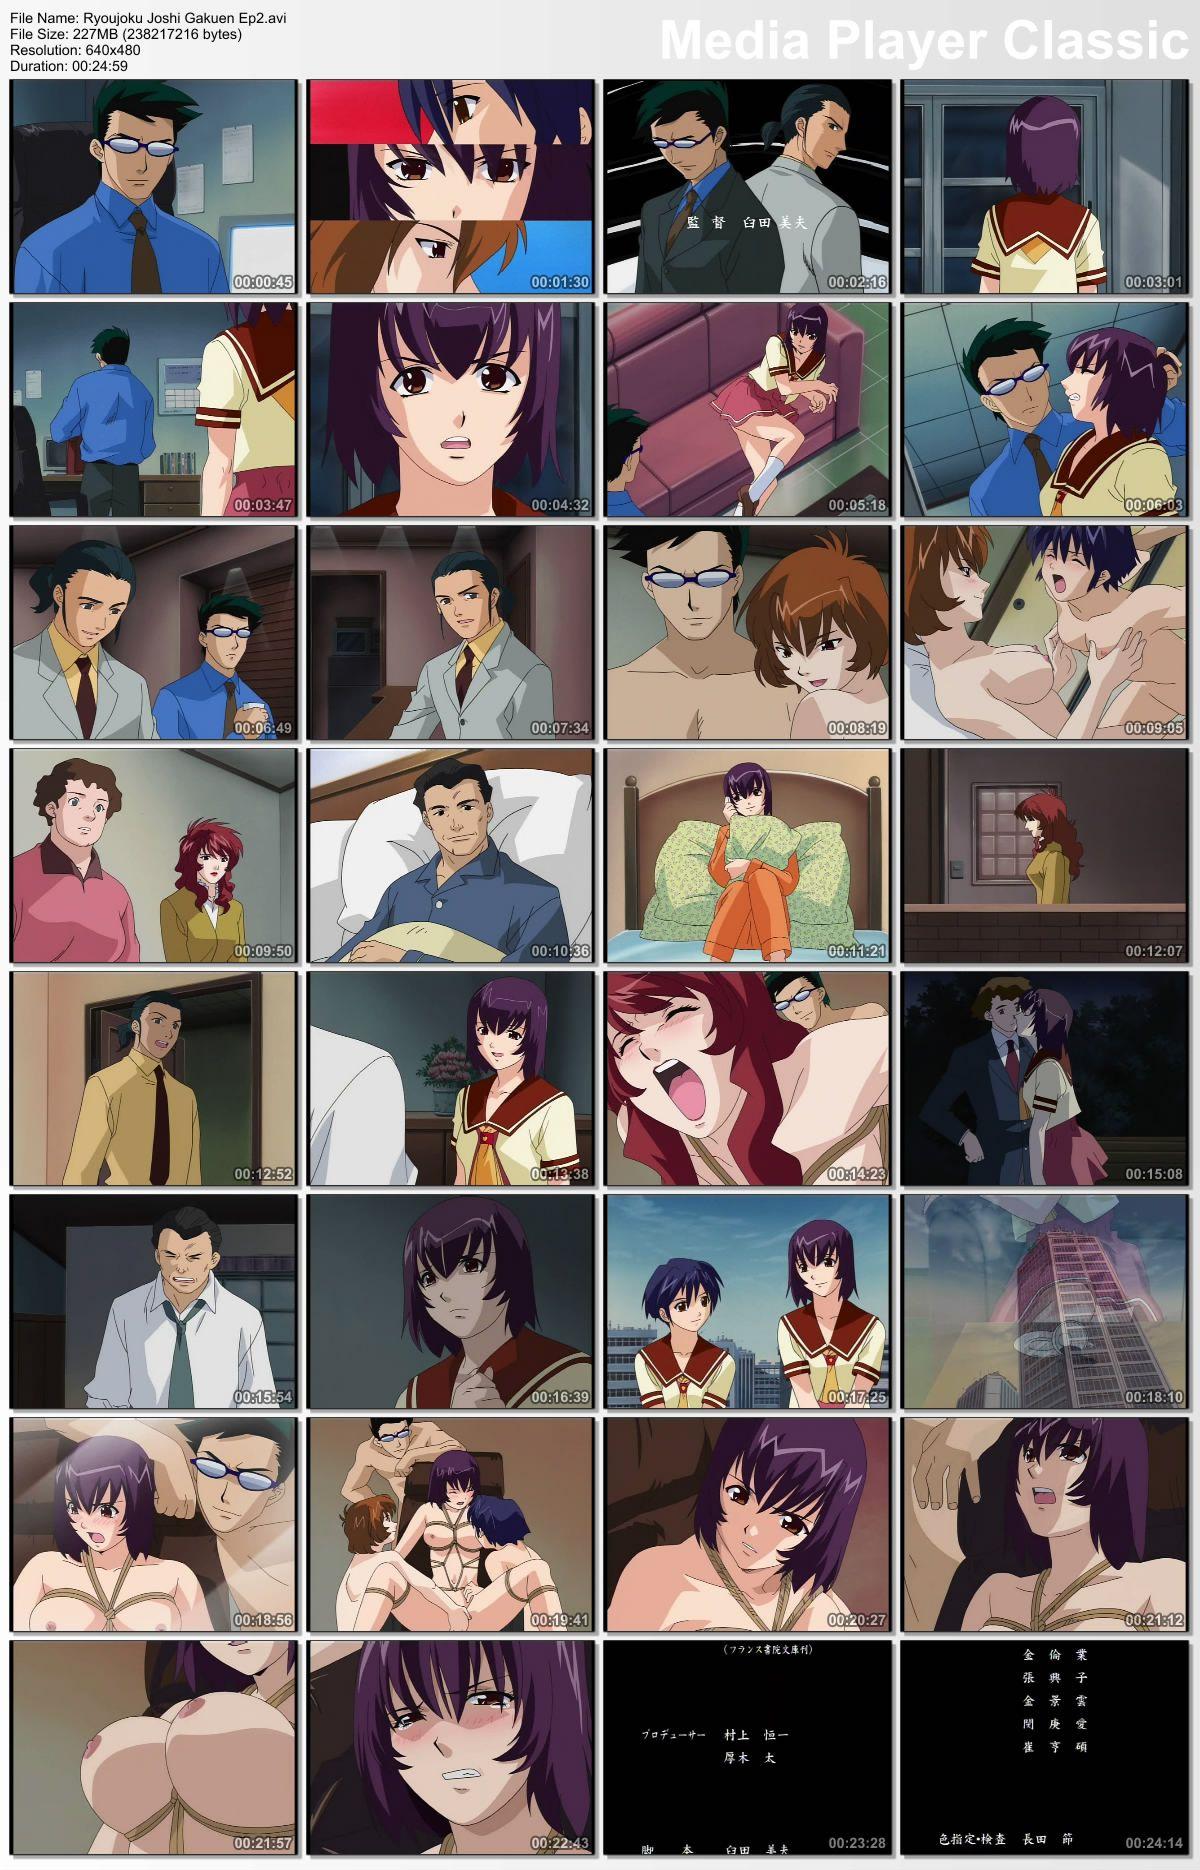 Ryoujoku Joshi Gakuen / Школа унижения девушки [2 из 2] [JAP] Anime Hentai